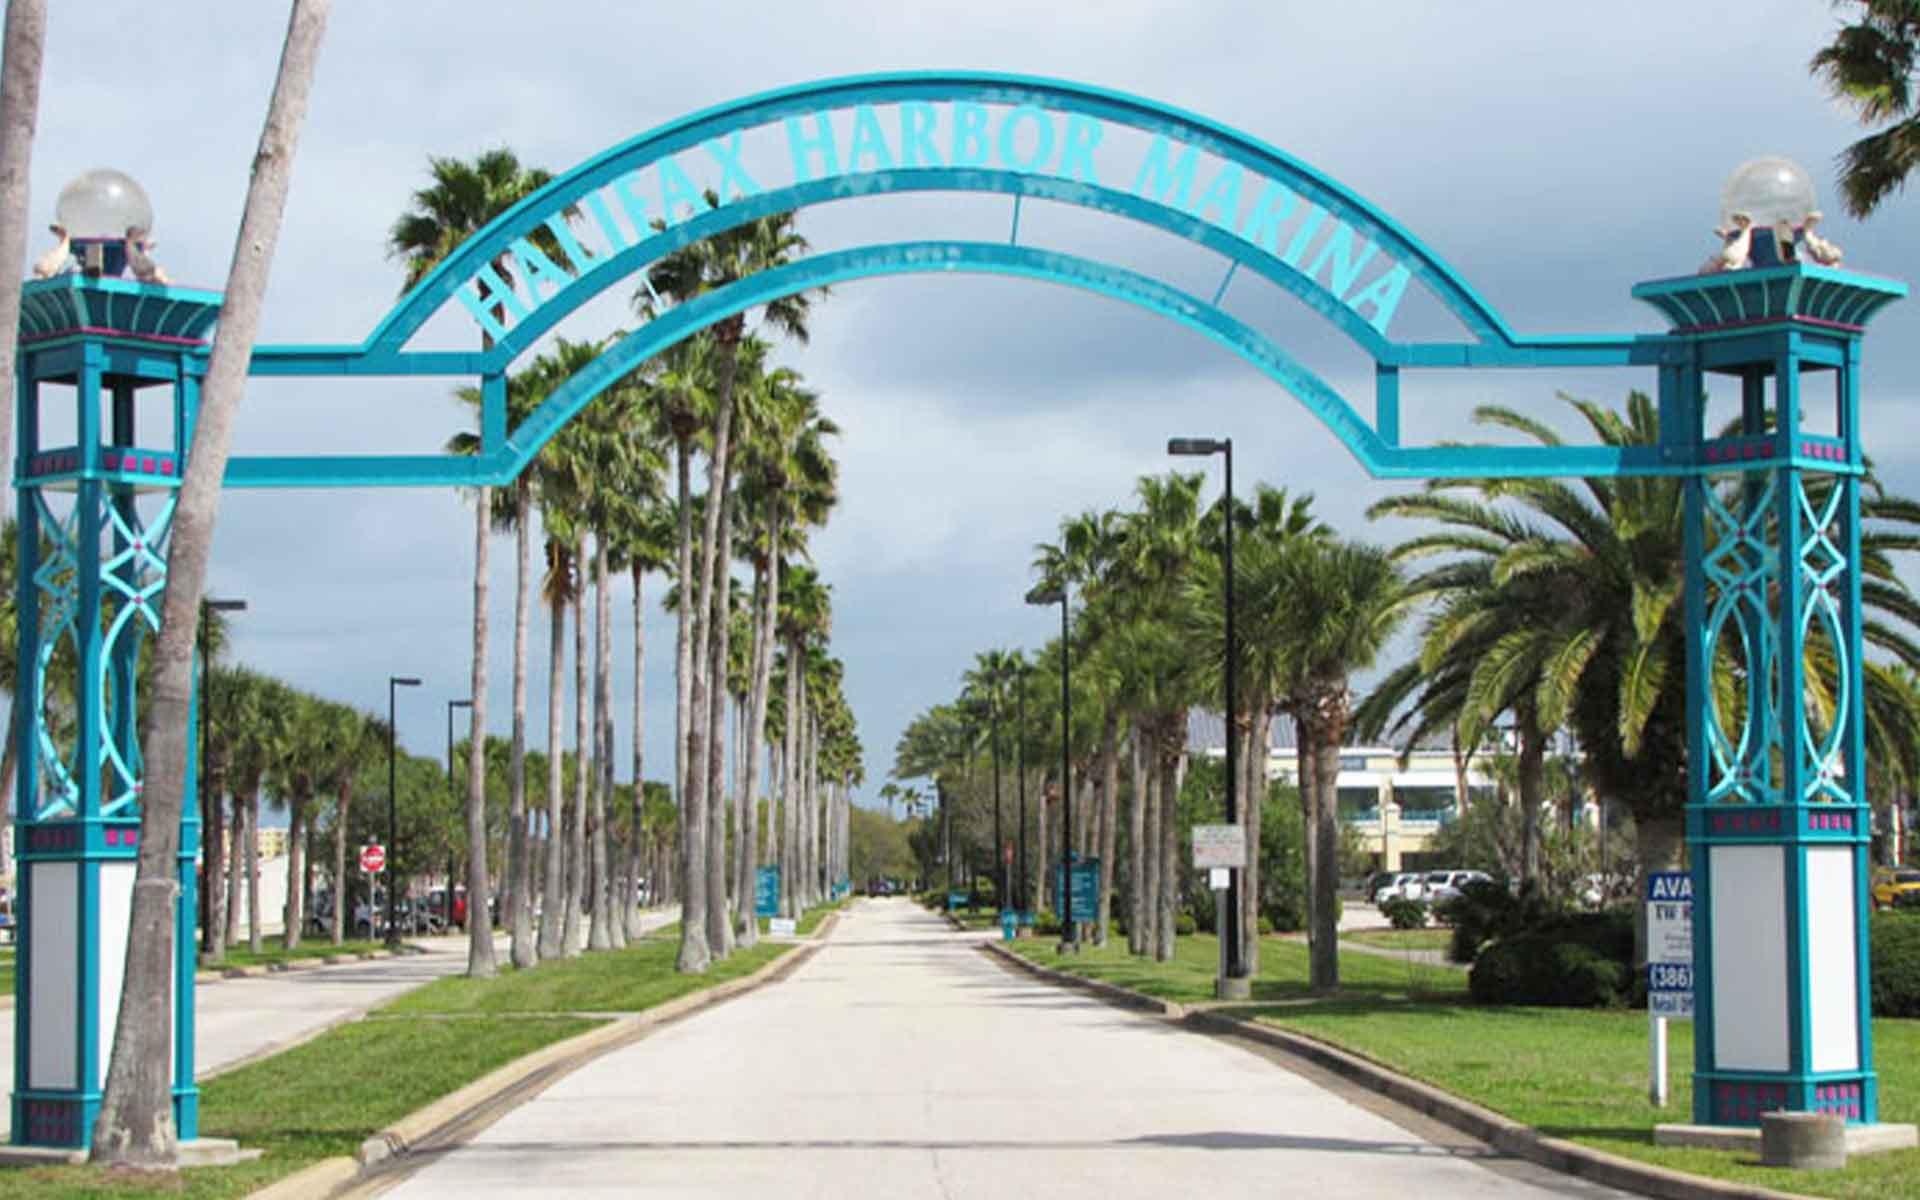 F3 Marina Fort Lauderdale Exterior Render